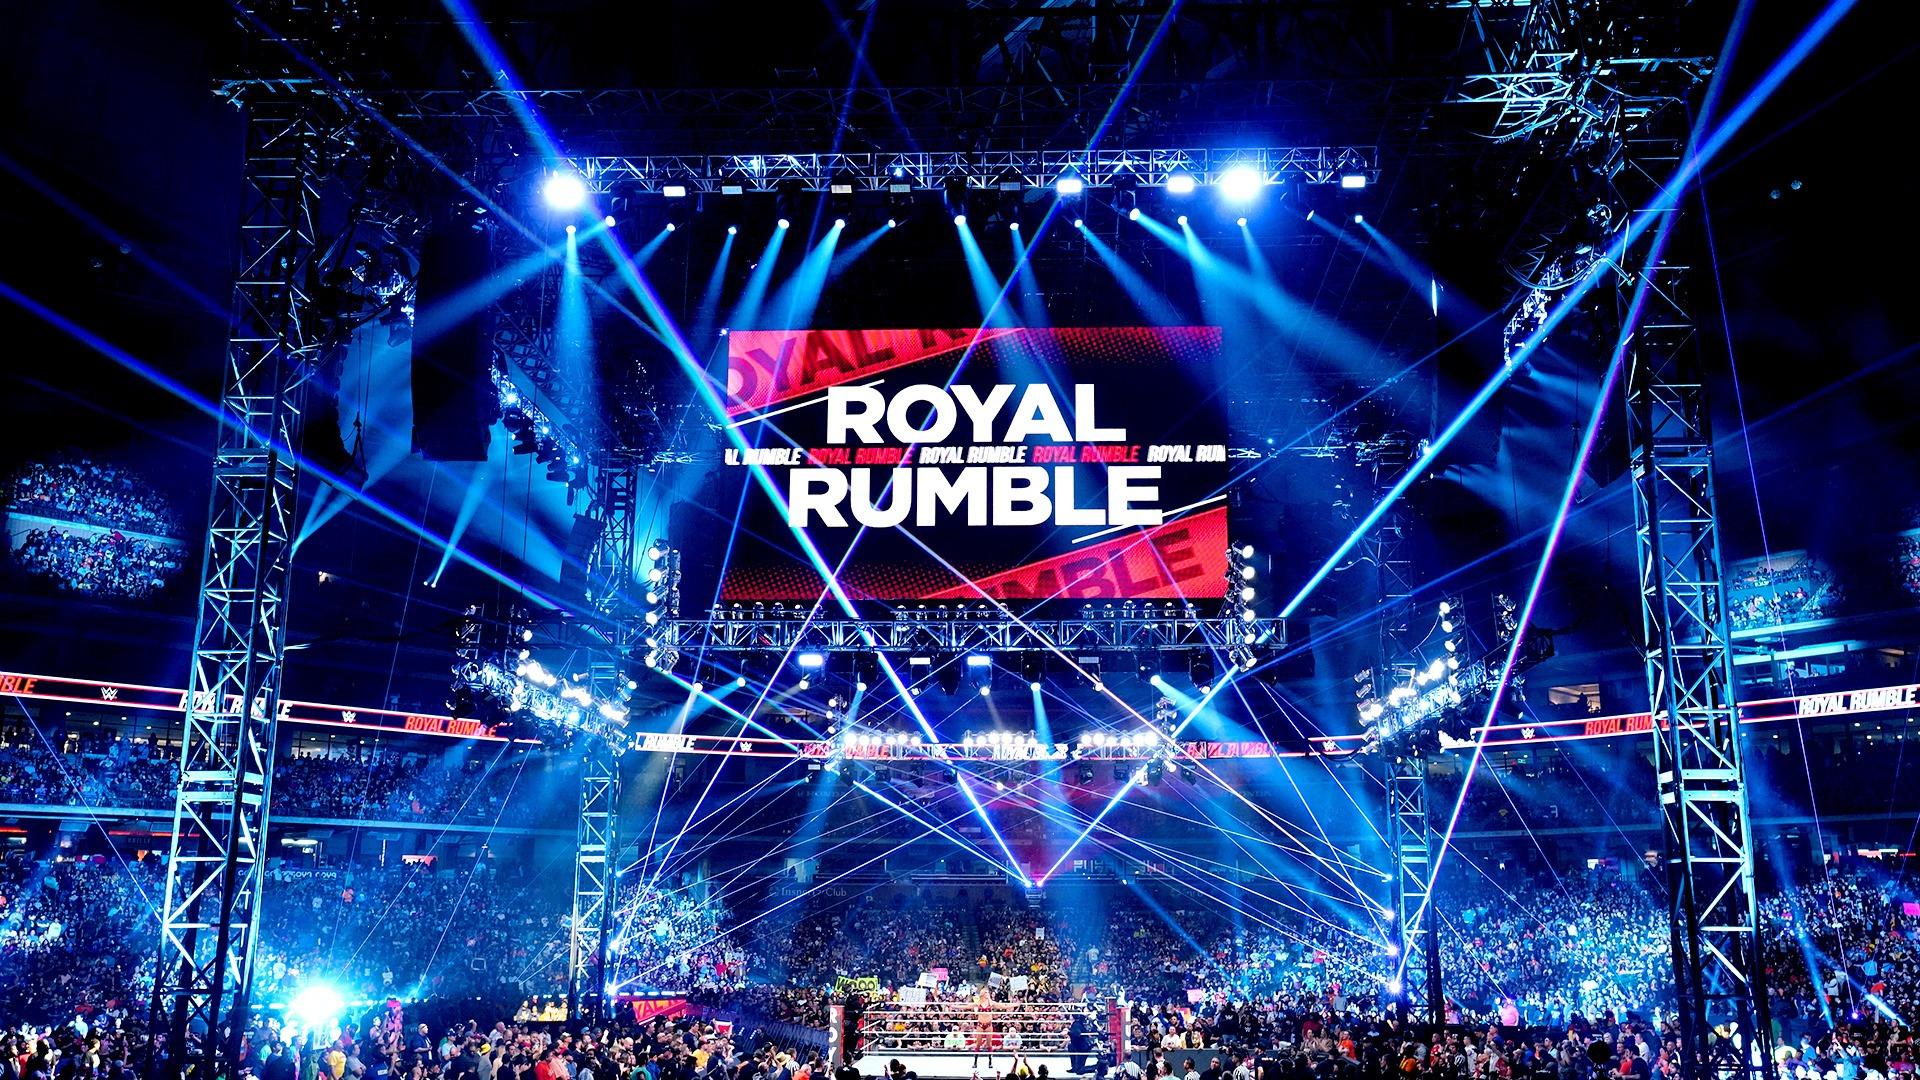 Royal Rumble 2022 será em St. Louis